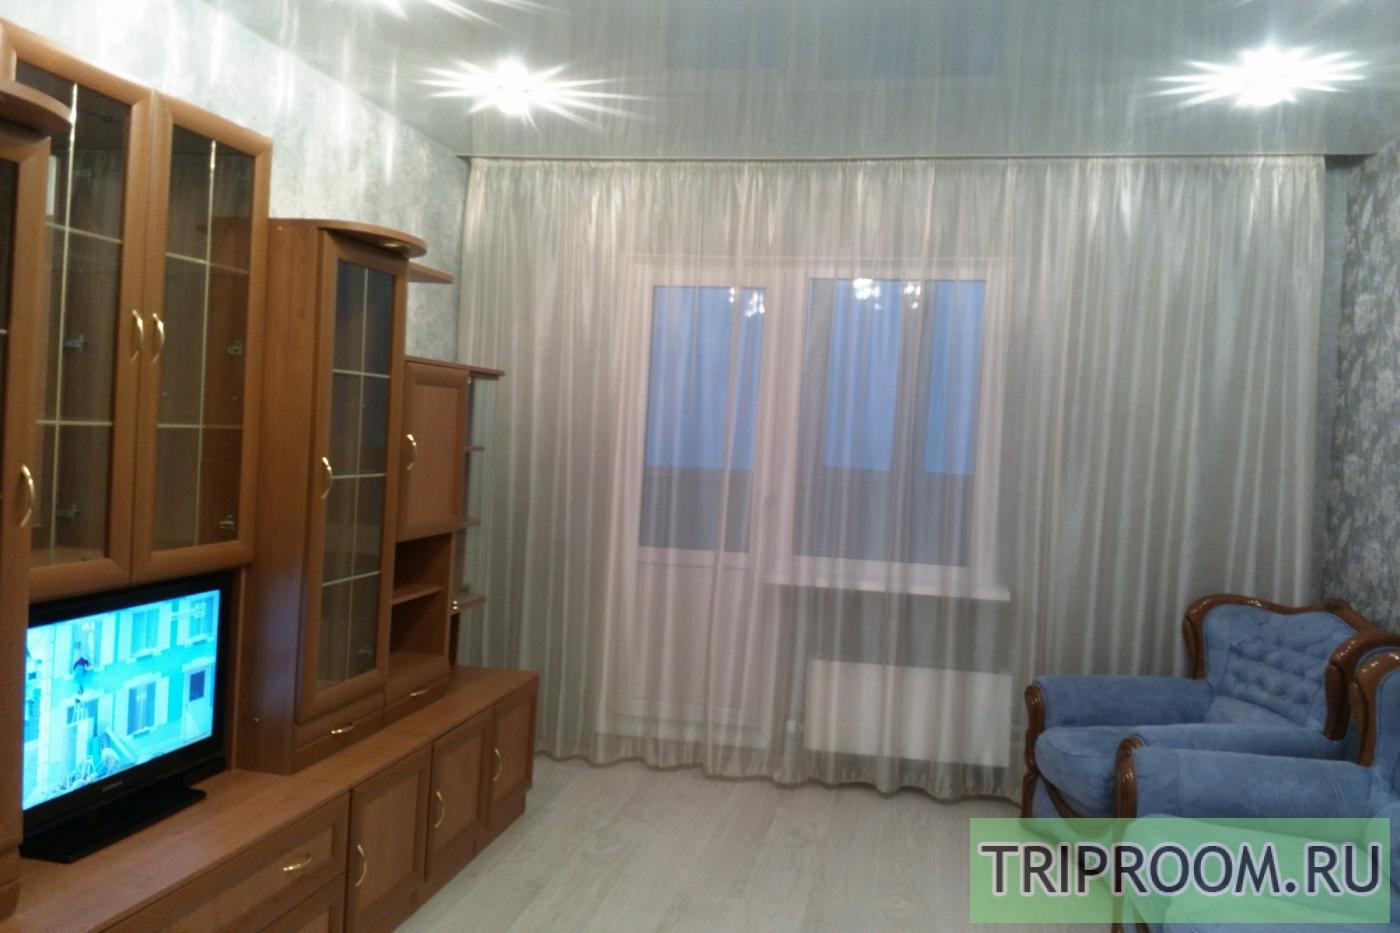 1-комнатная квартира посуточно (вариант № 28926), ул. Тюменский тракт, фото № 2